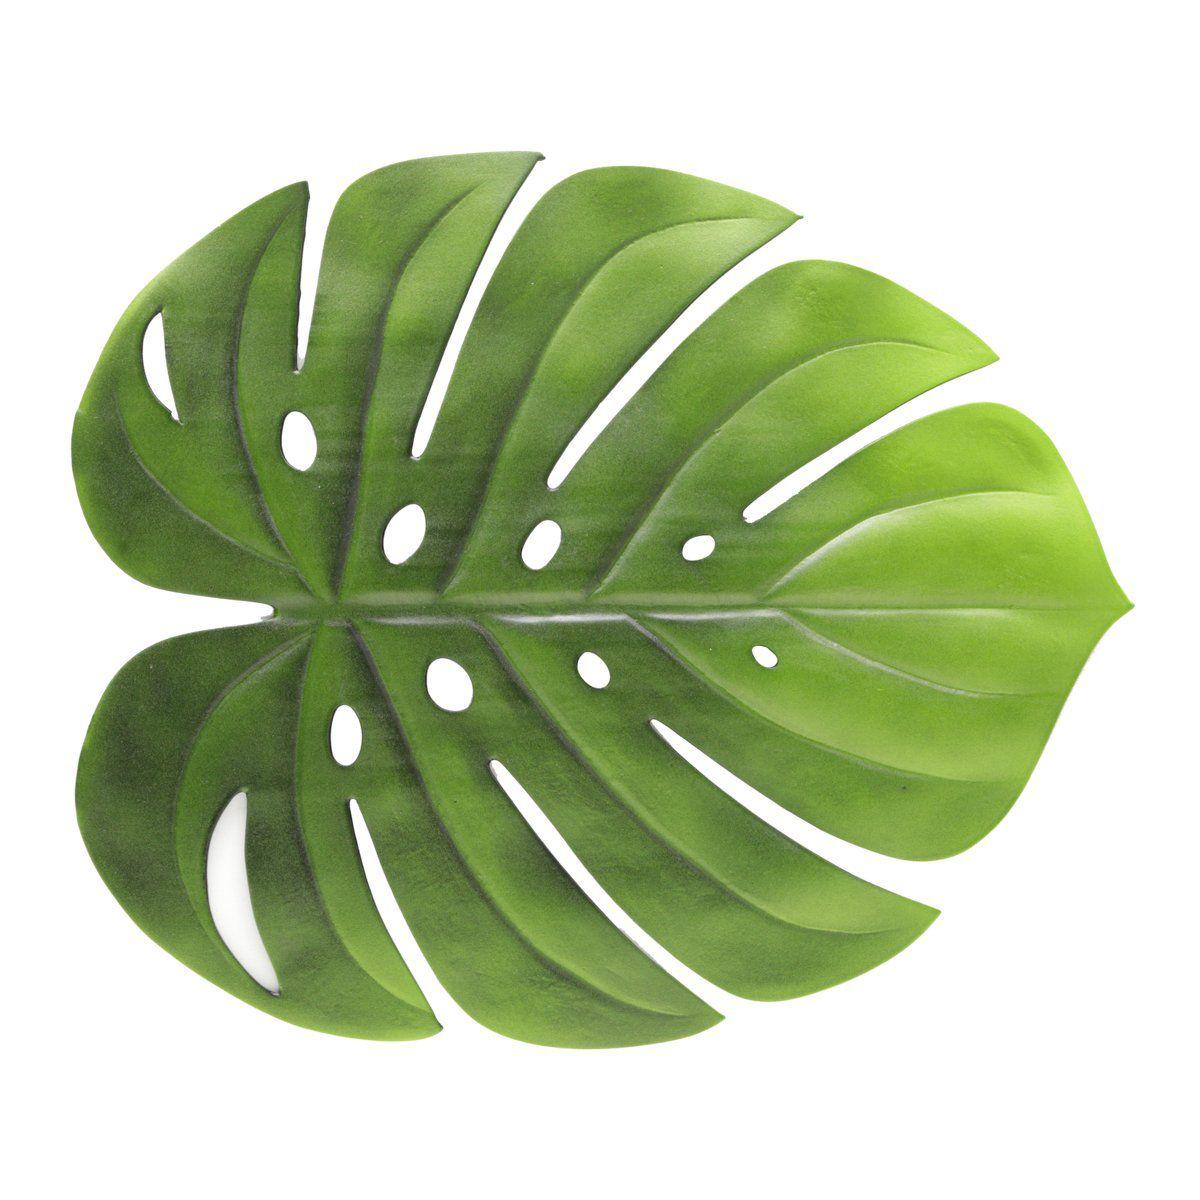 Jogo americano de 1 unidade 48 cm de EVA verde Garden Leaf Lyor - L6892